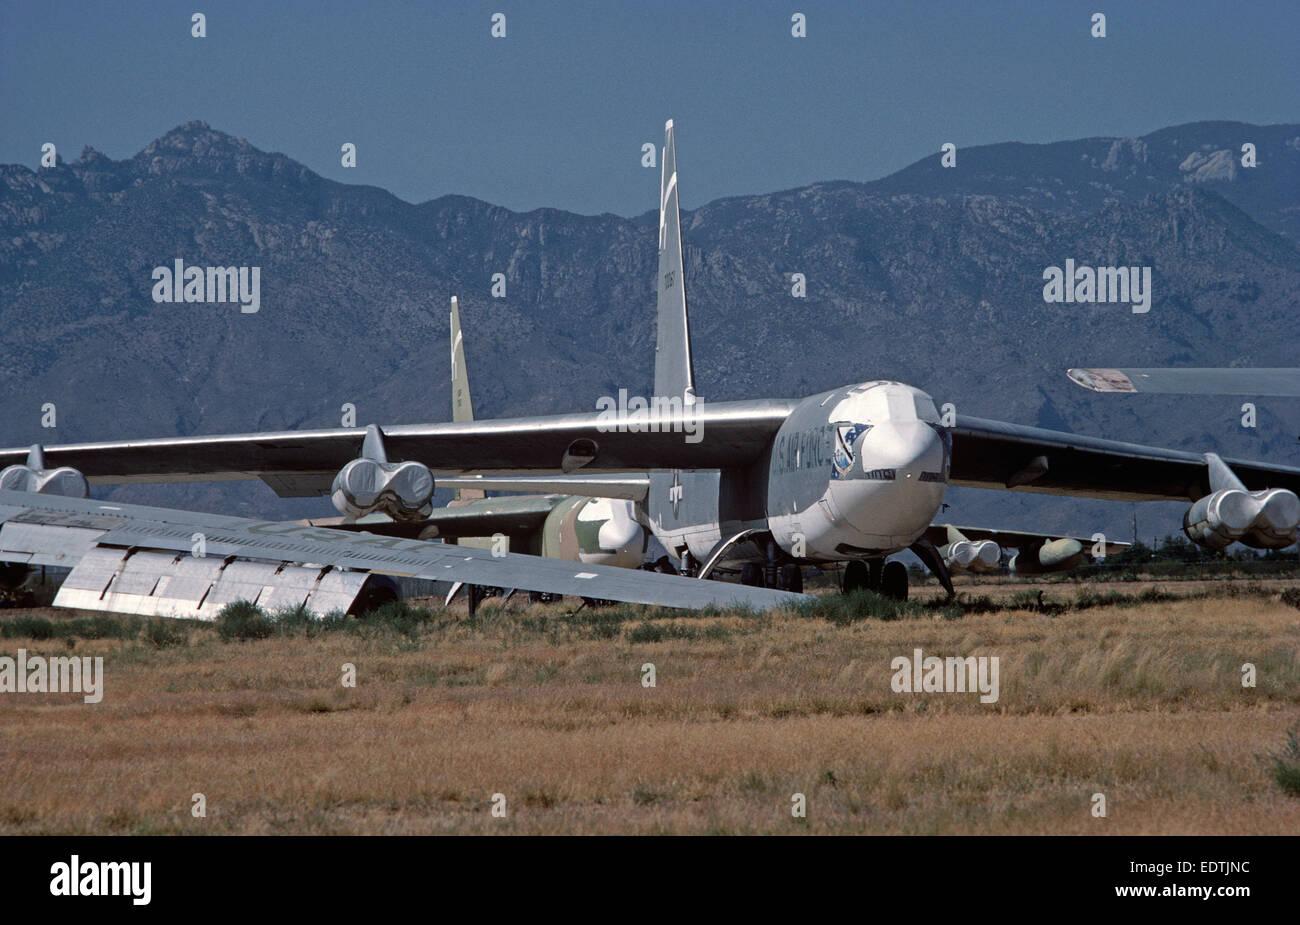 Cimetiere Avion Usa usa la base aérienne davis-monthan tuscon, arizona, avions cimetière